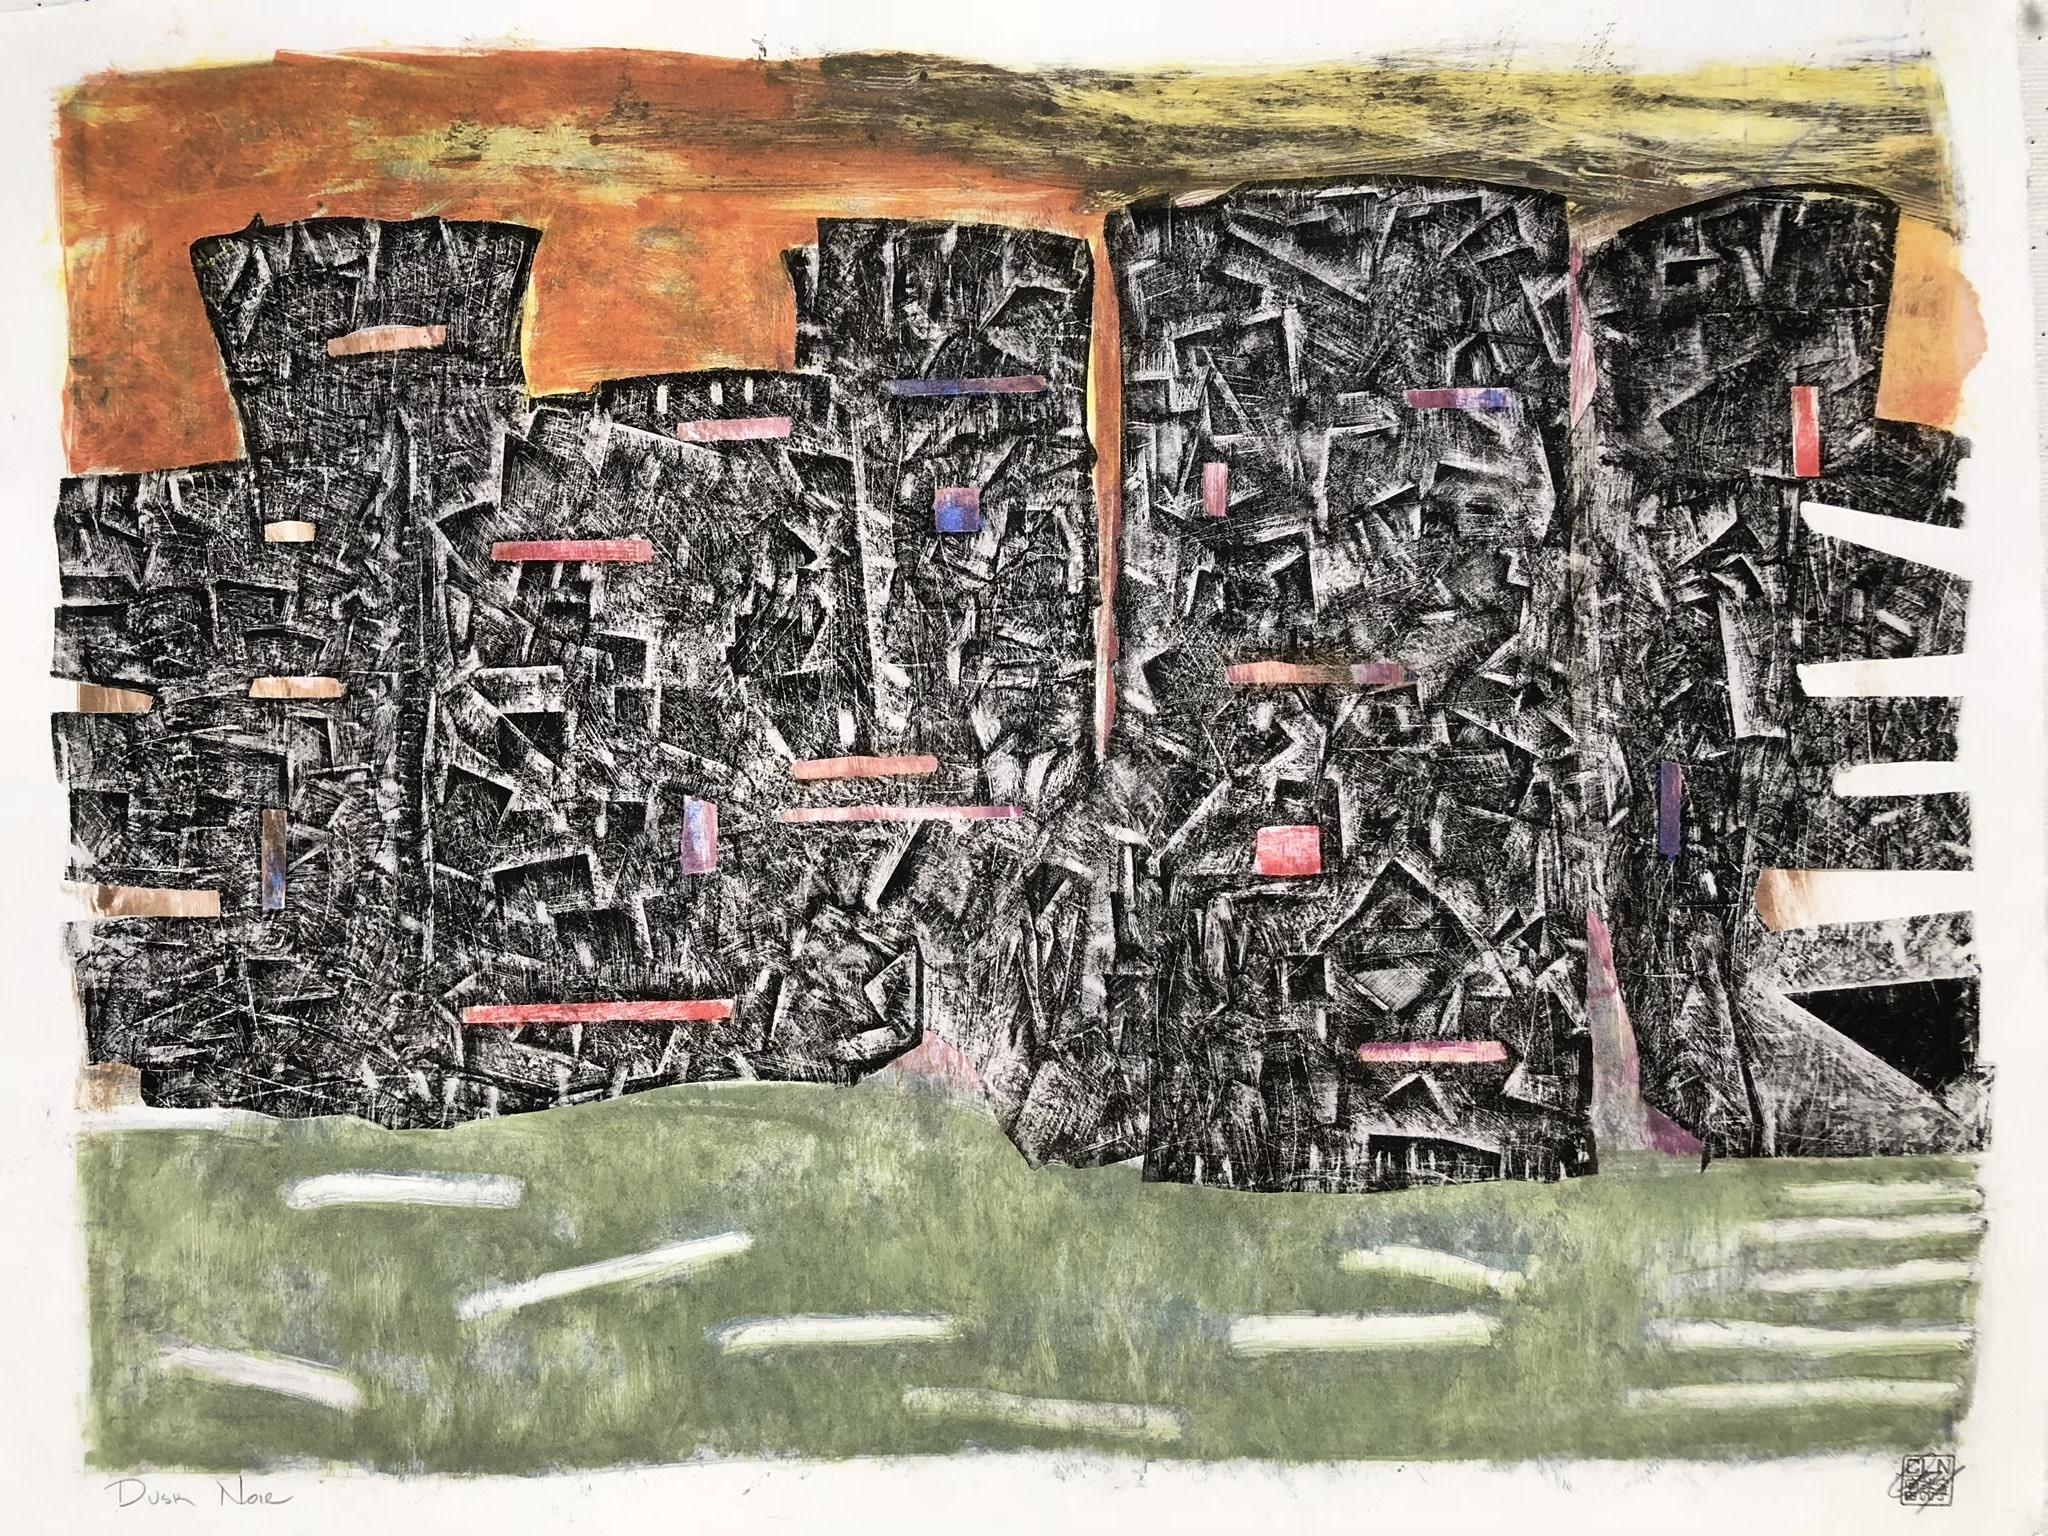 <span class=&#34;link fancybox-details-link&#34;><a href=&#34;/exhibitions/13/works/image_standalone456/&#34;>View Detail Page</a></span><p>Carl Nanoff</p><p>Dusk Noir</p><p>lithograph & monotype</p>